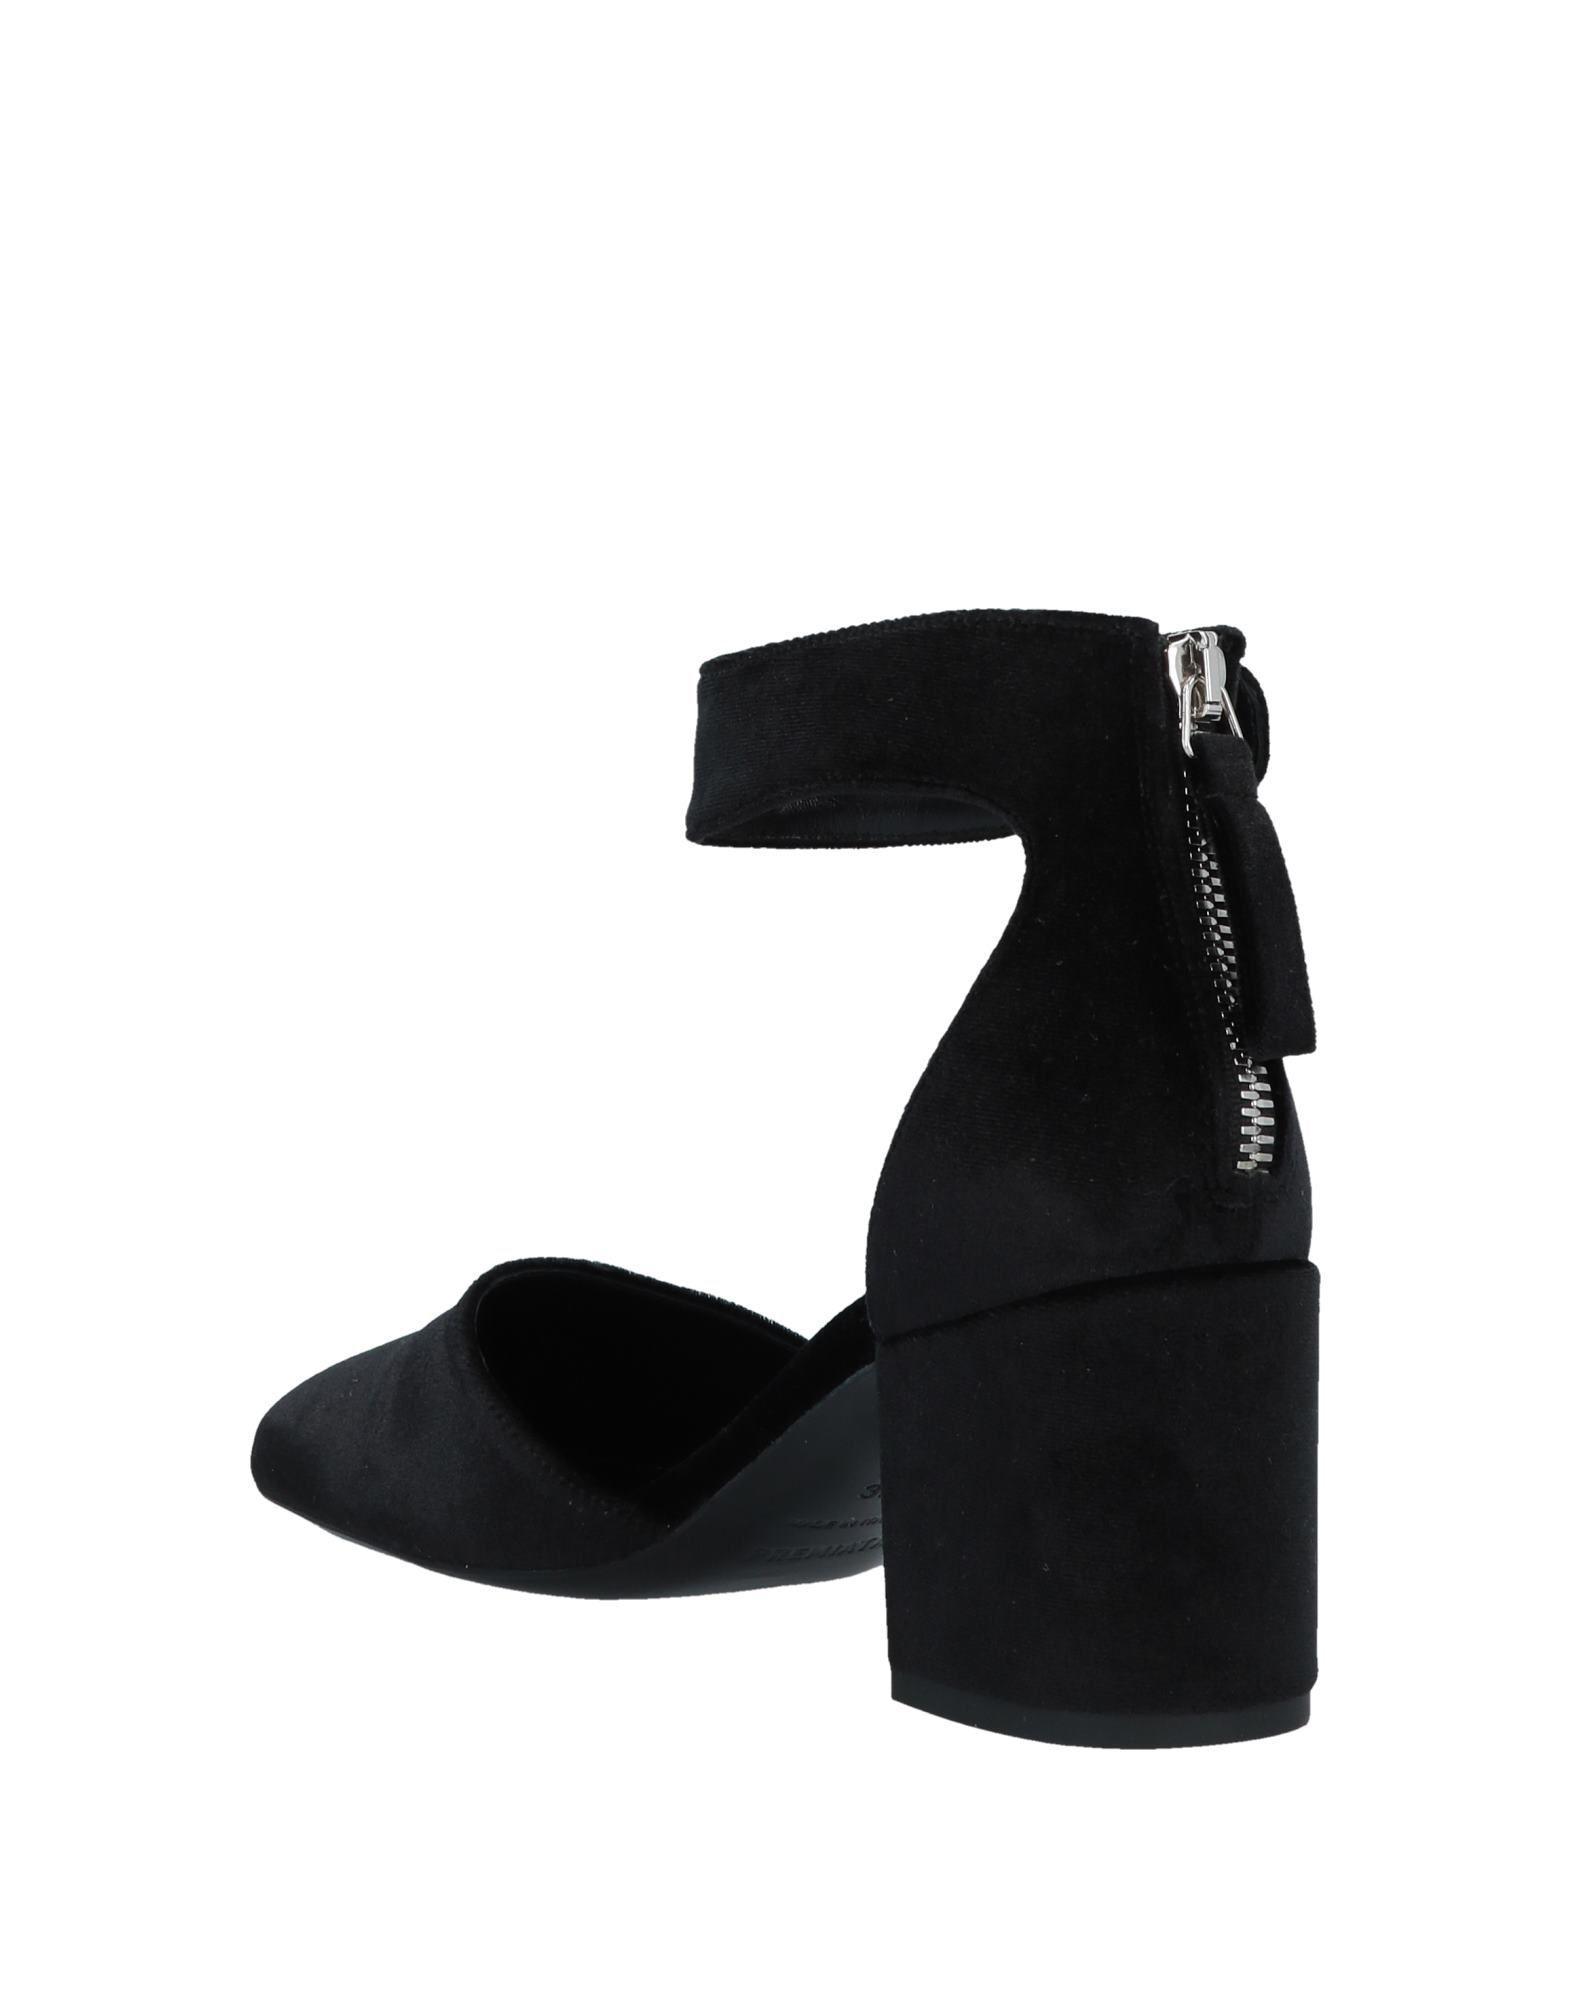 Zapatos de salón Premiata de Terciopelo de color Negro